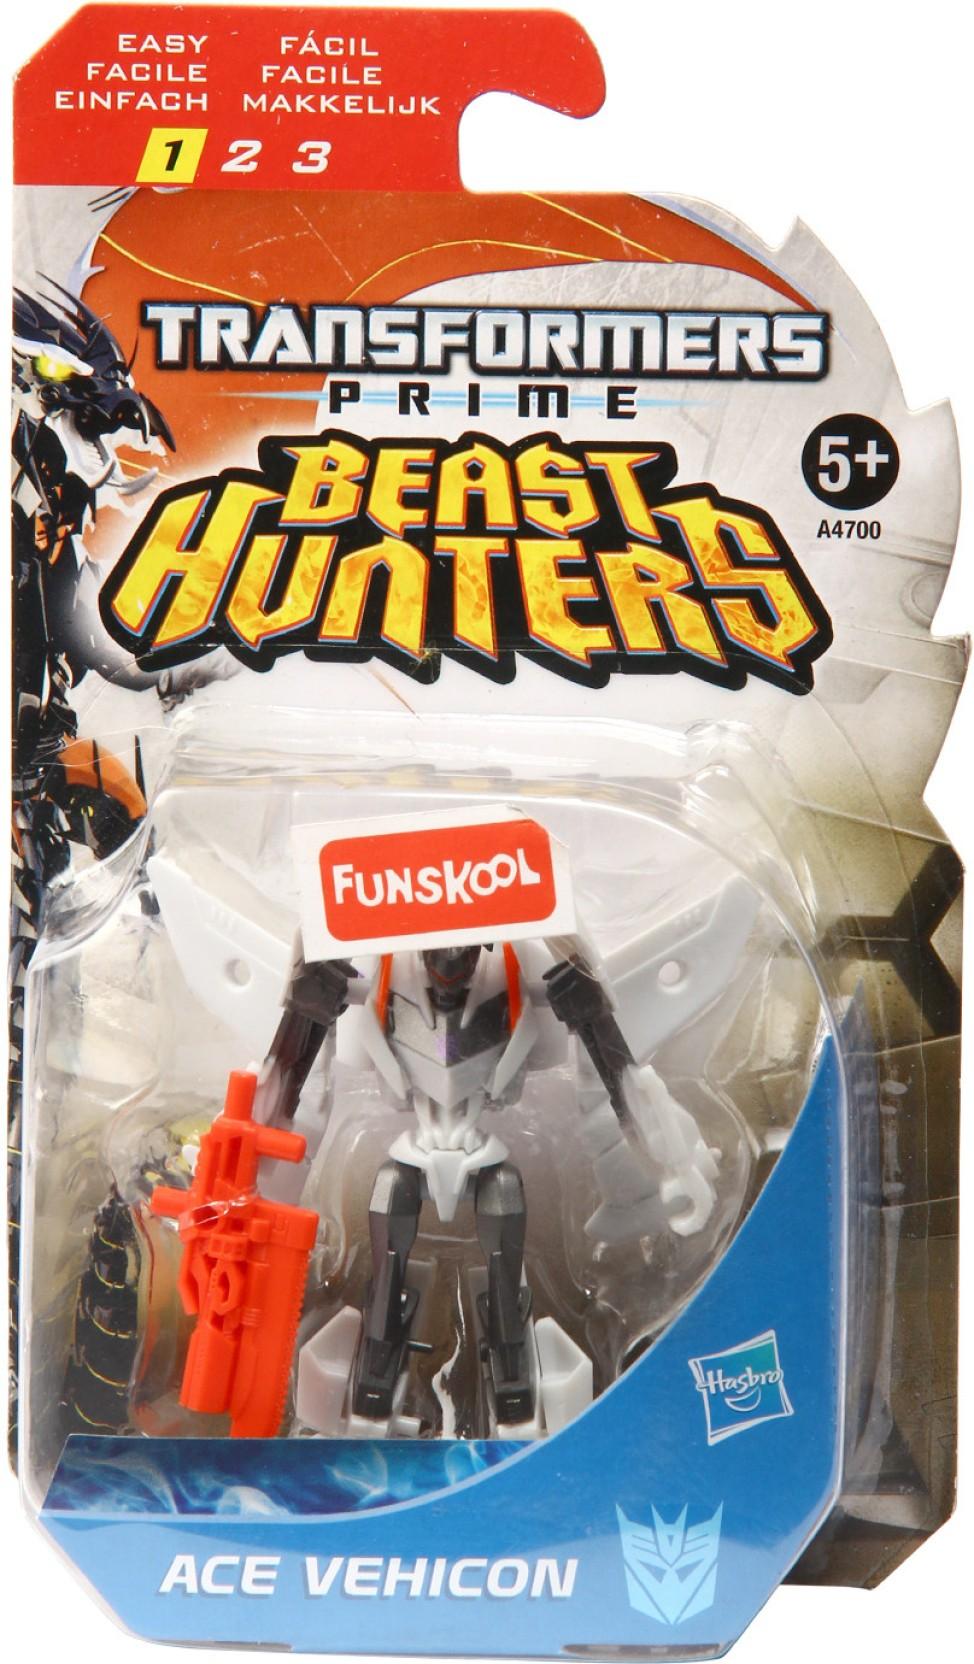 Funskool Transformers Prime Beast Hunters Ace Vehicon